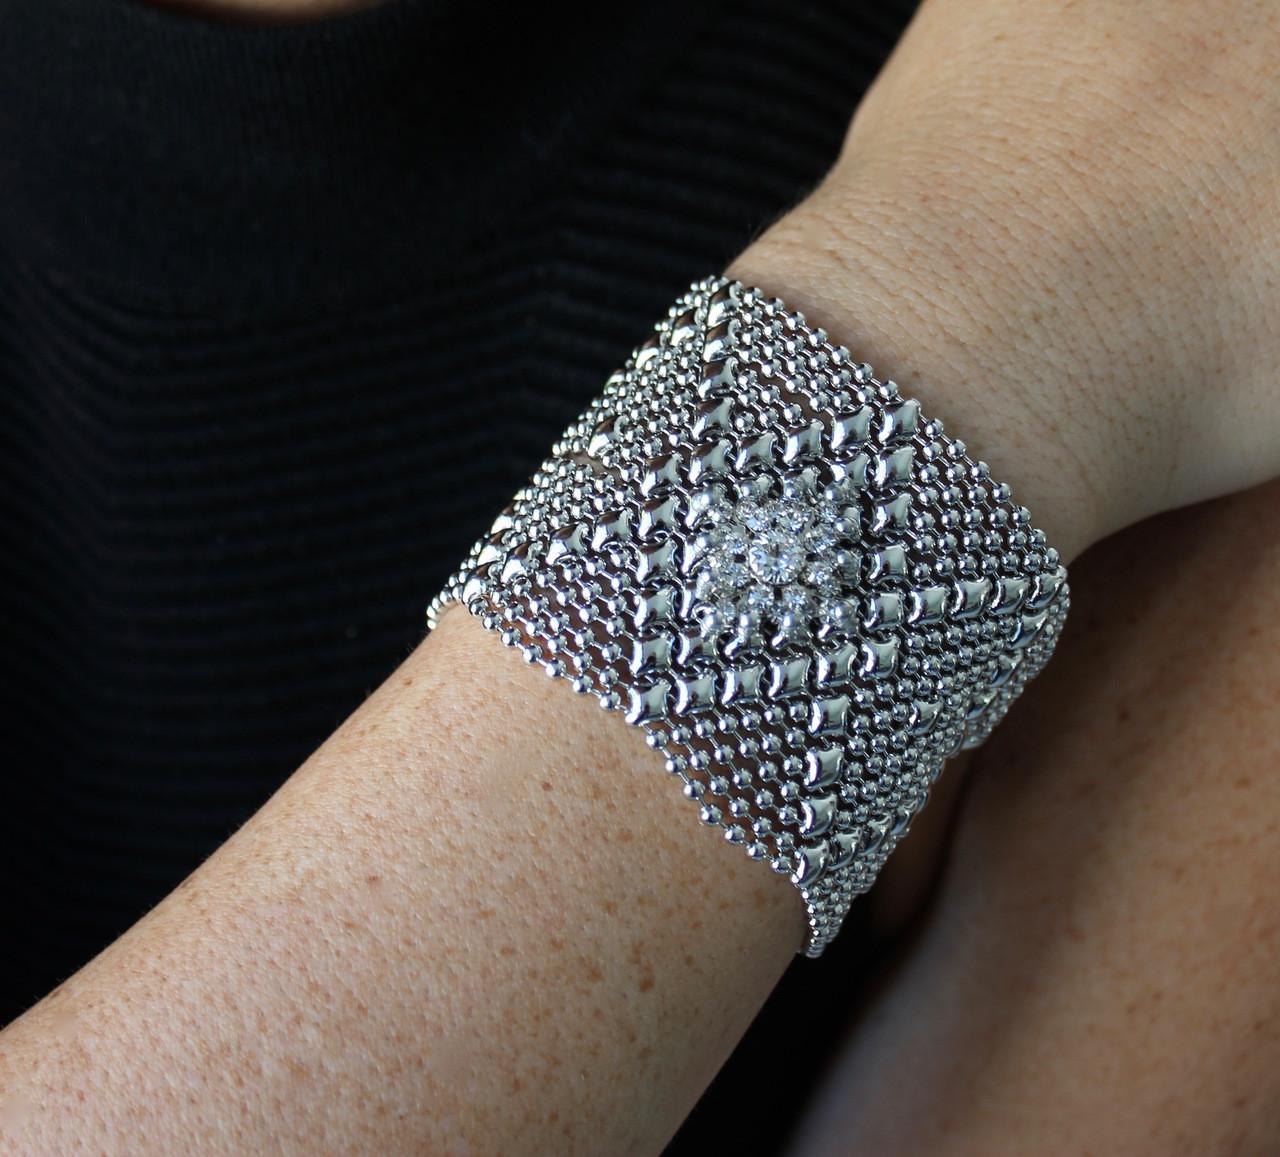 ea04a03e2 Sergio Gutierrez Liquid Metal Silver Mesh Cuff Bracelet Swarovski ...